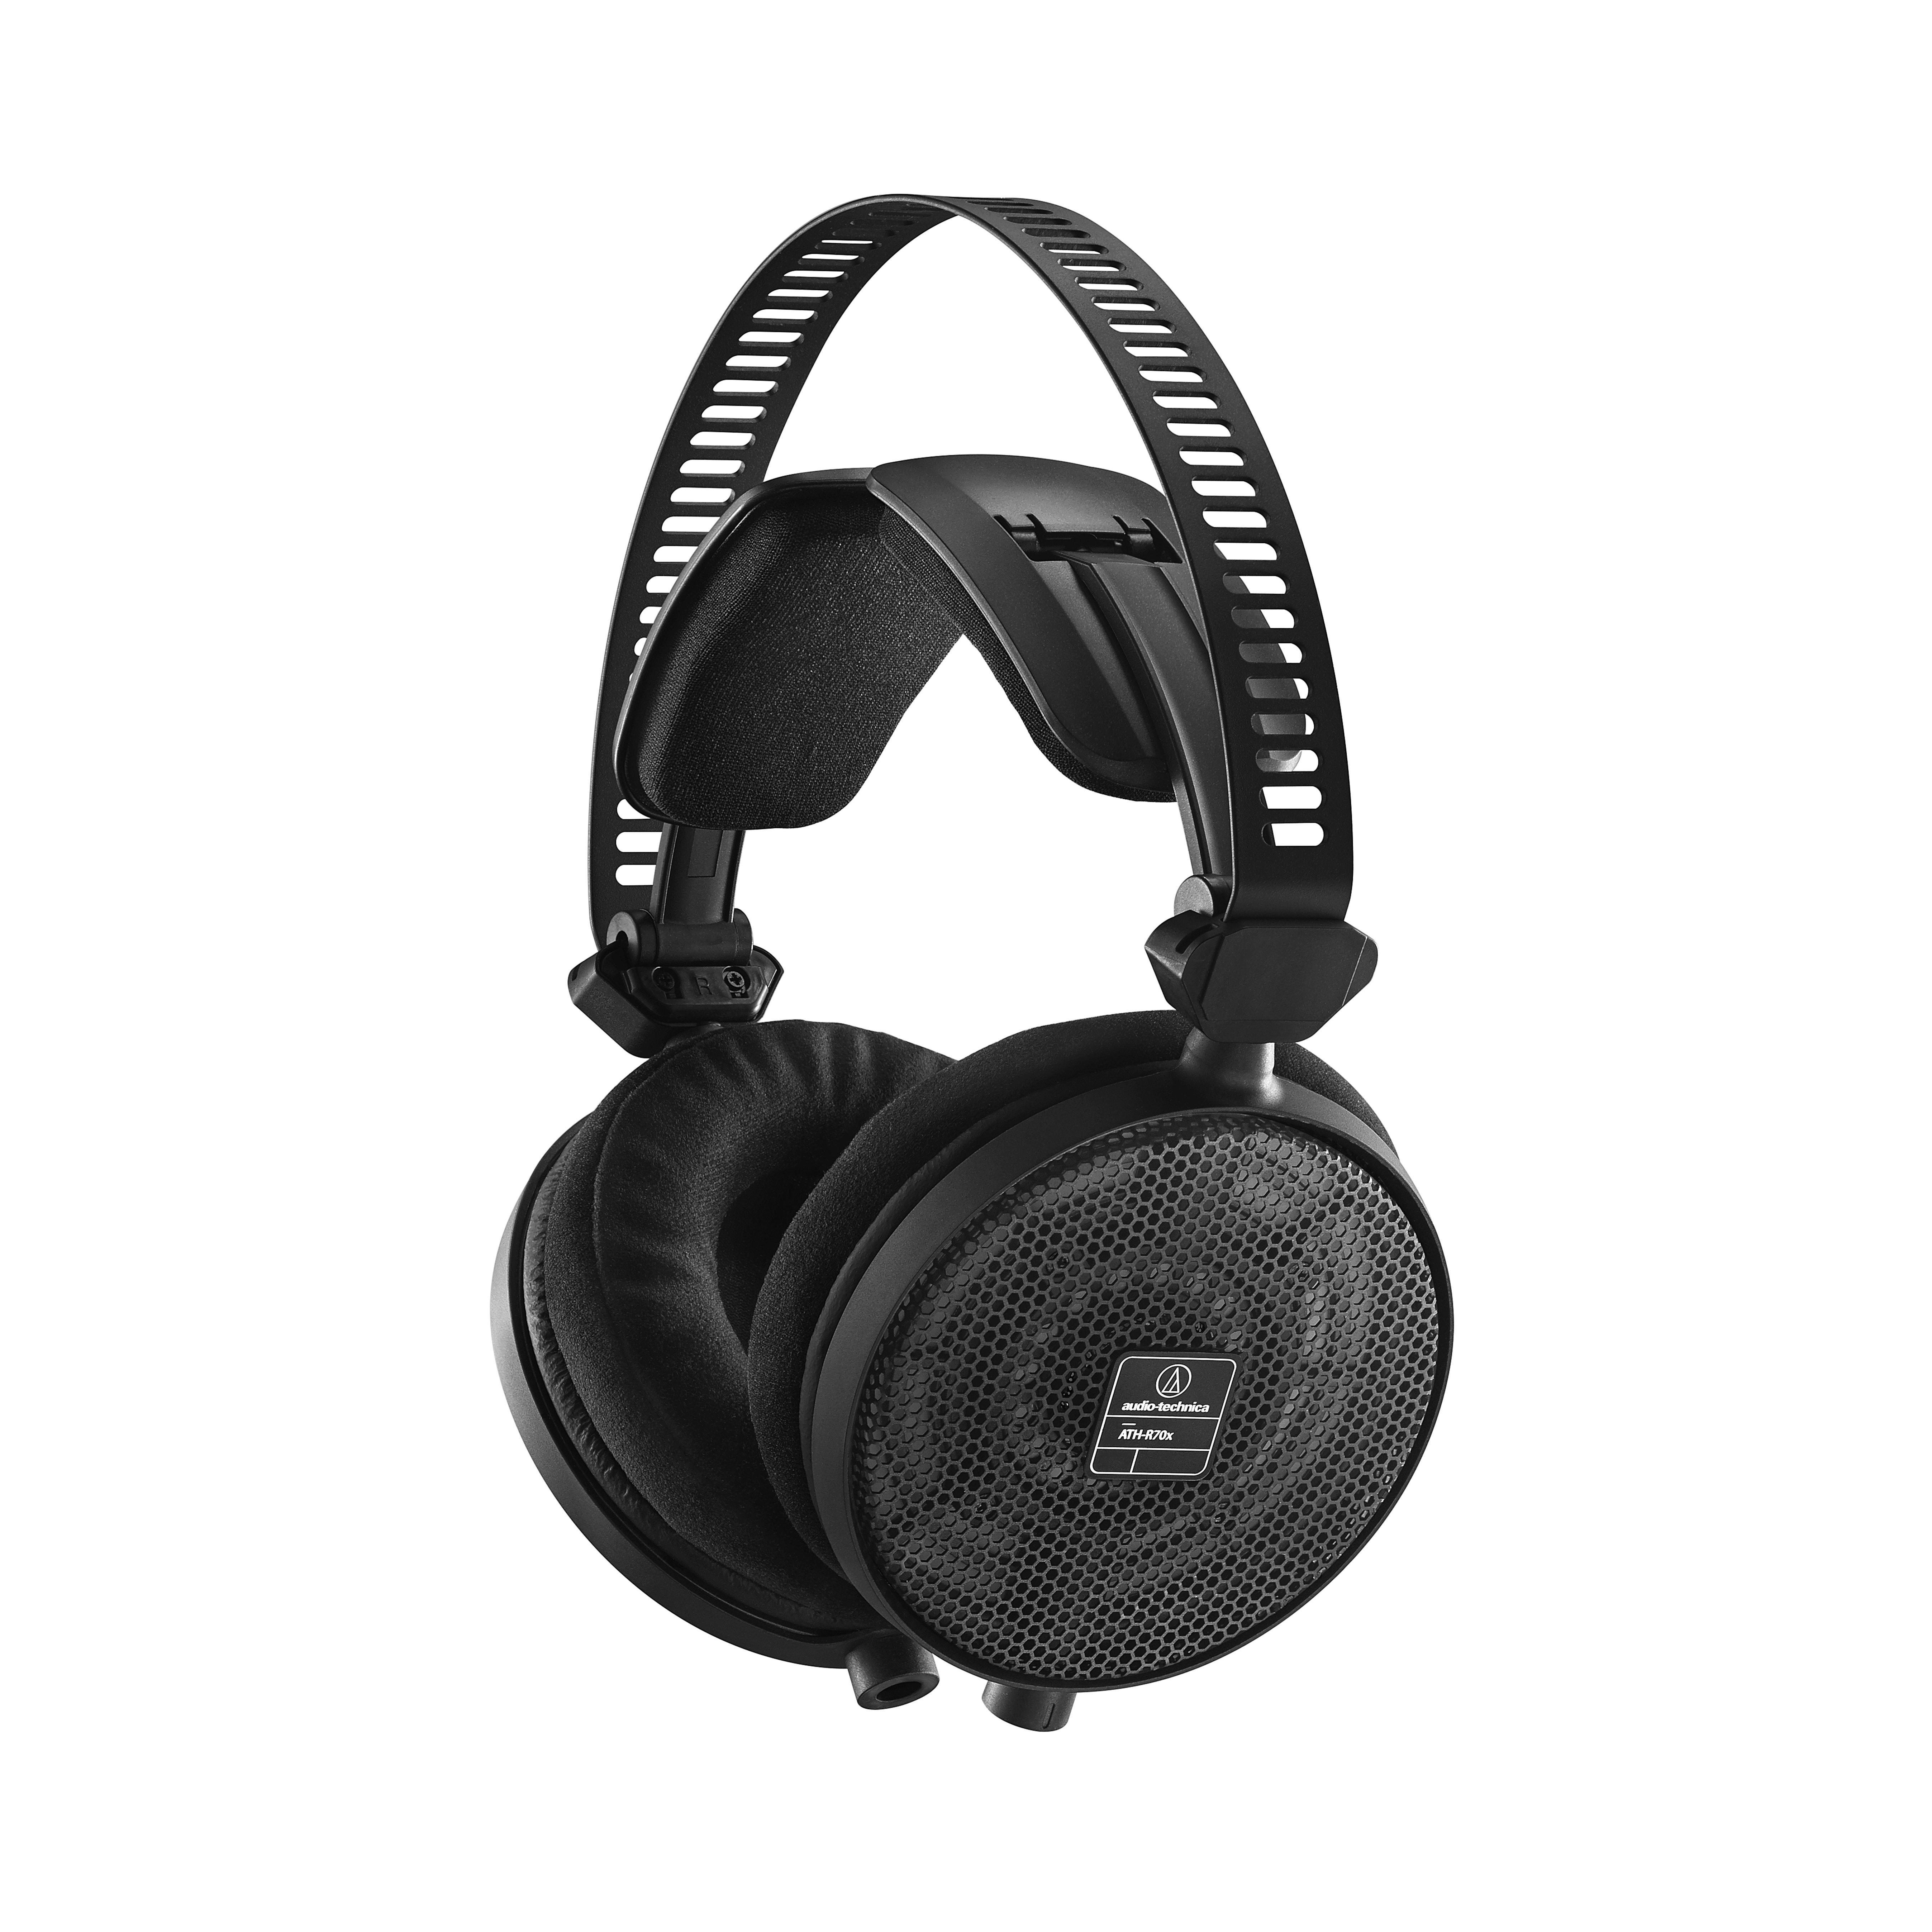 ATH-R70x Professional Open-Back Reference Headphones | Studio Headphones || Audi